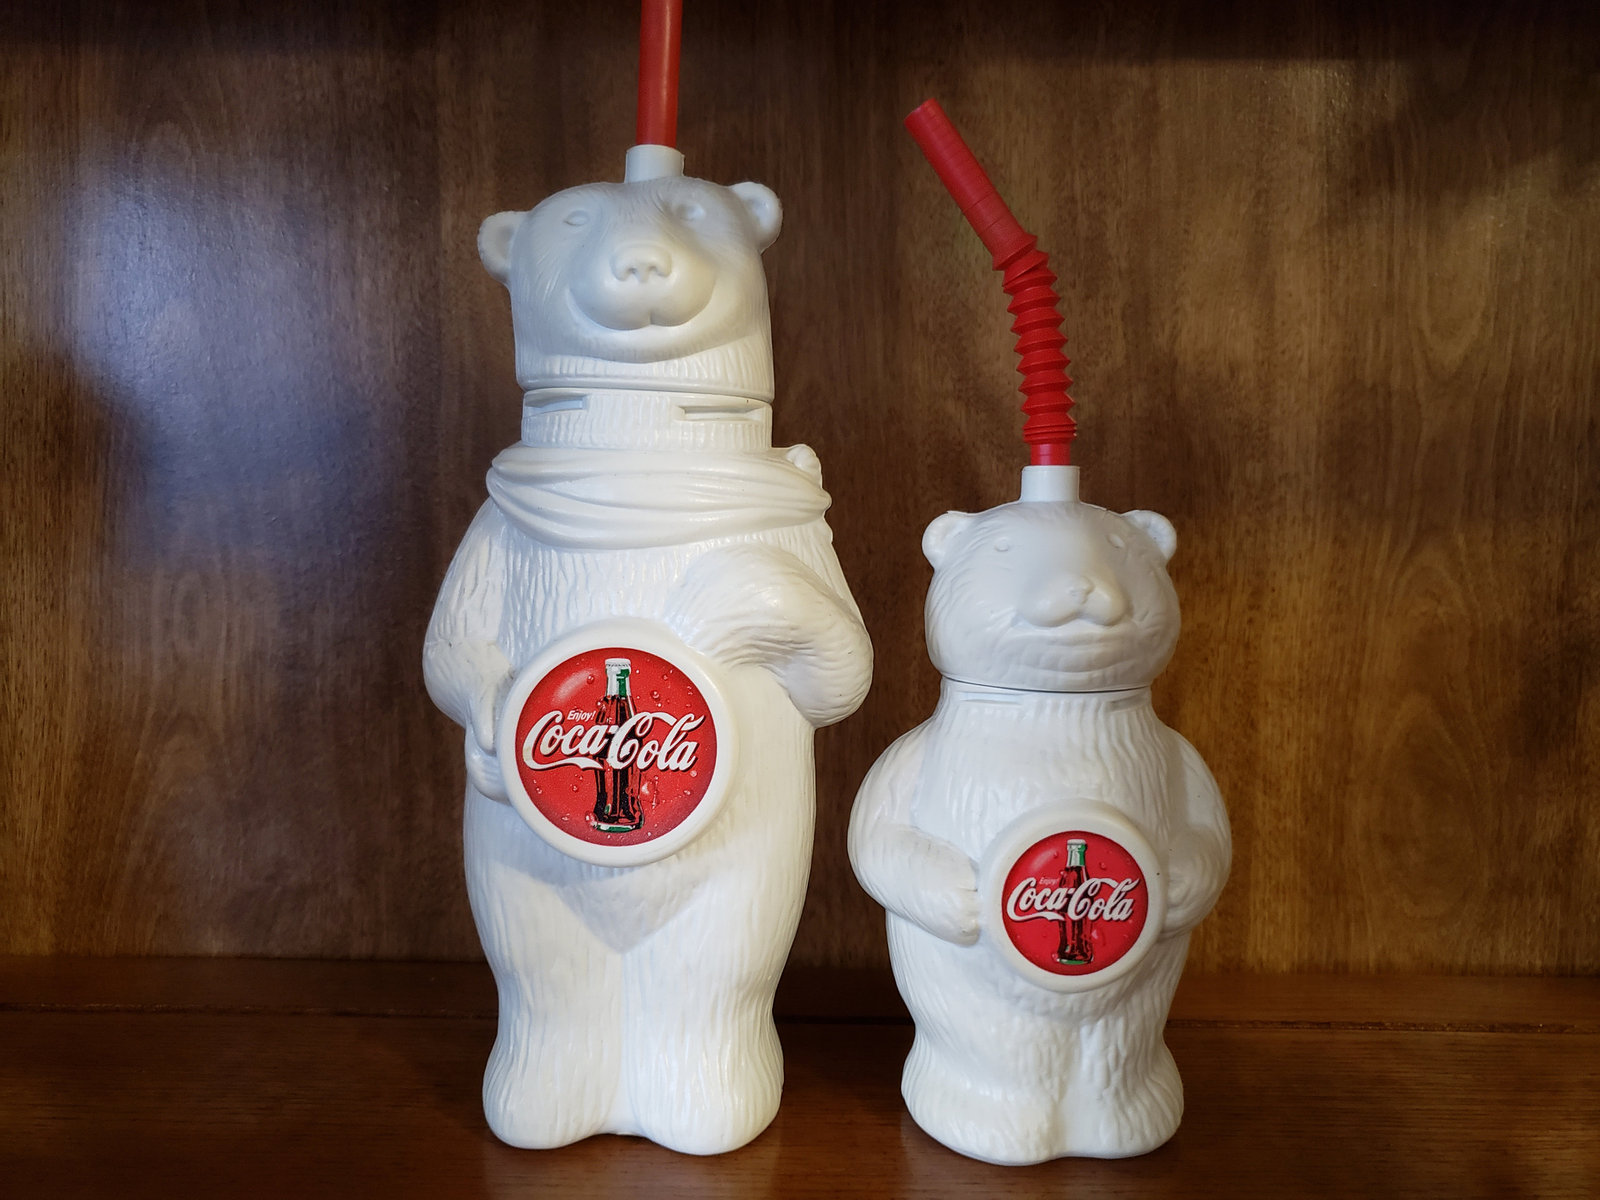 Coca-Cola Travel Cup Tumbler Vintage-esque BRAND NEW